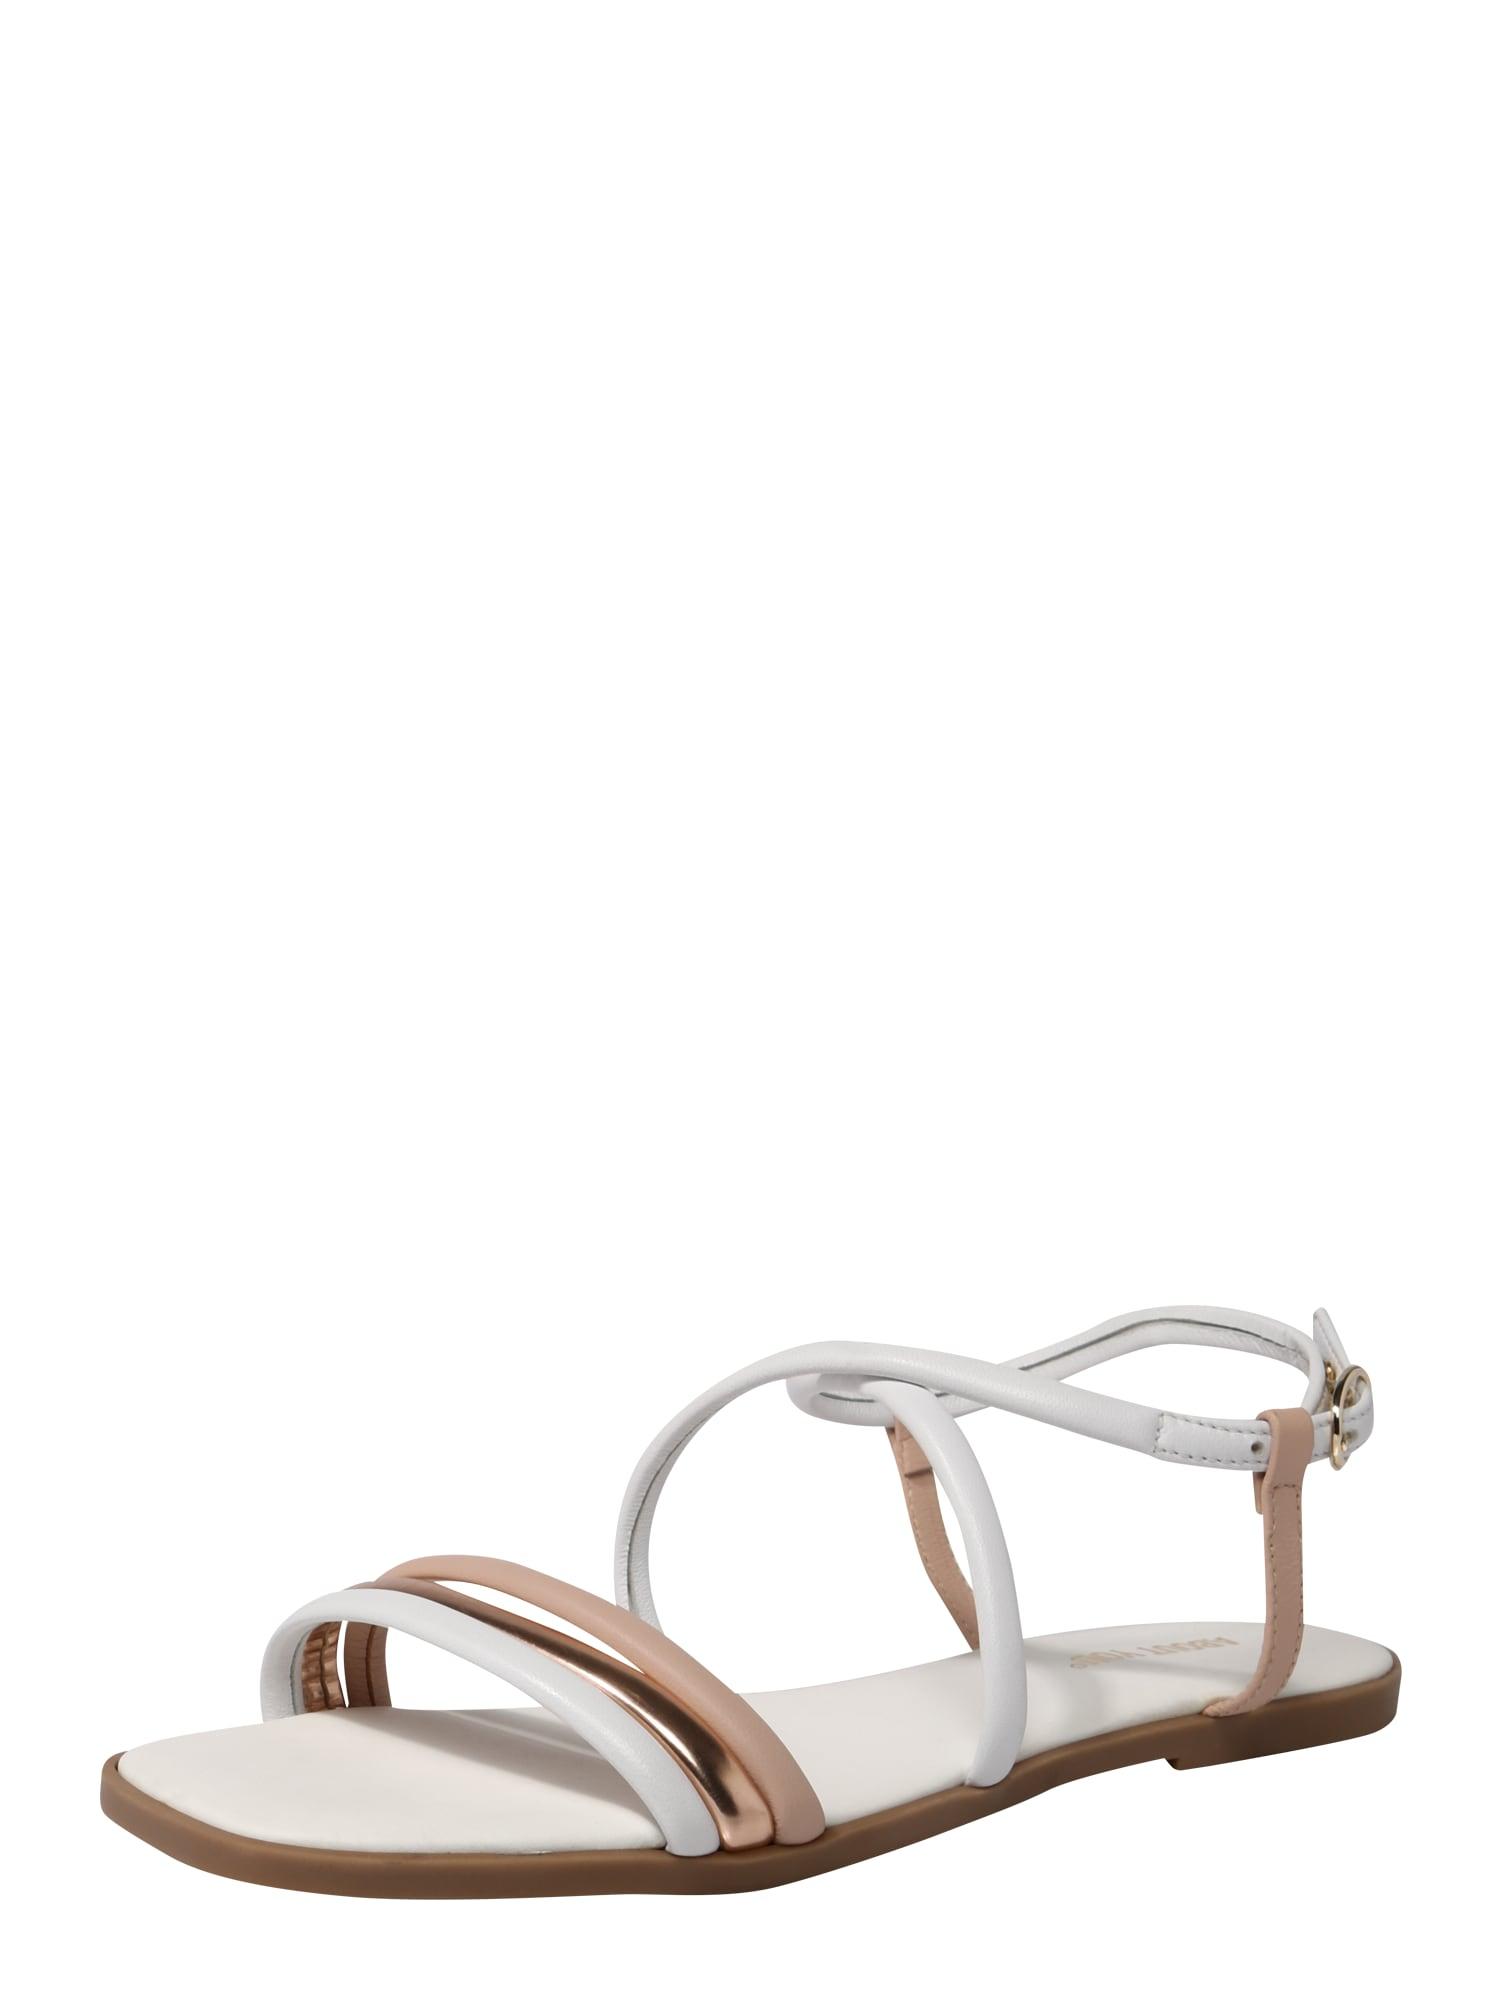 Páskové sandály Cara bílá ABOUT YOU